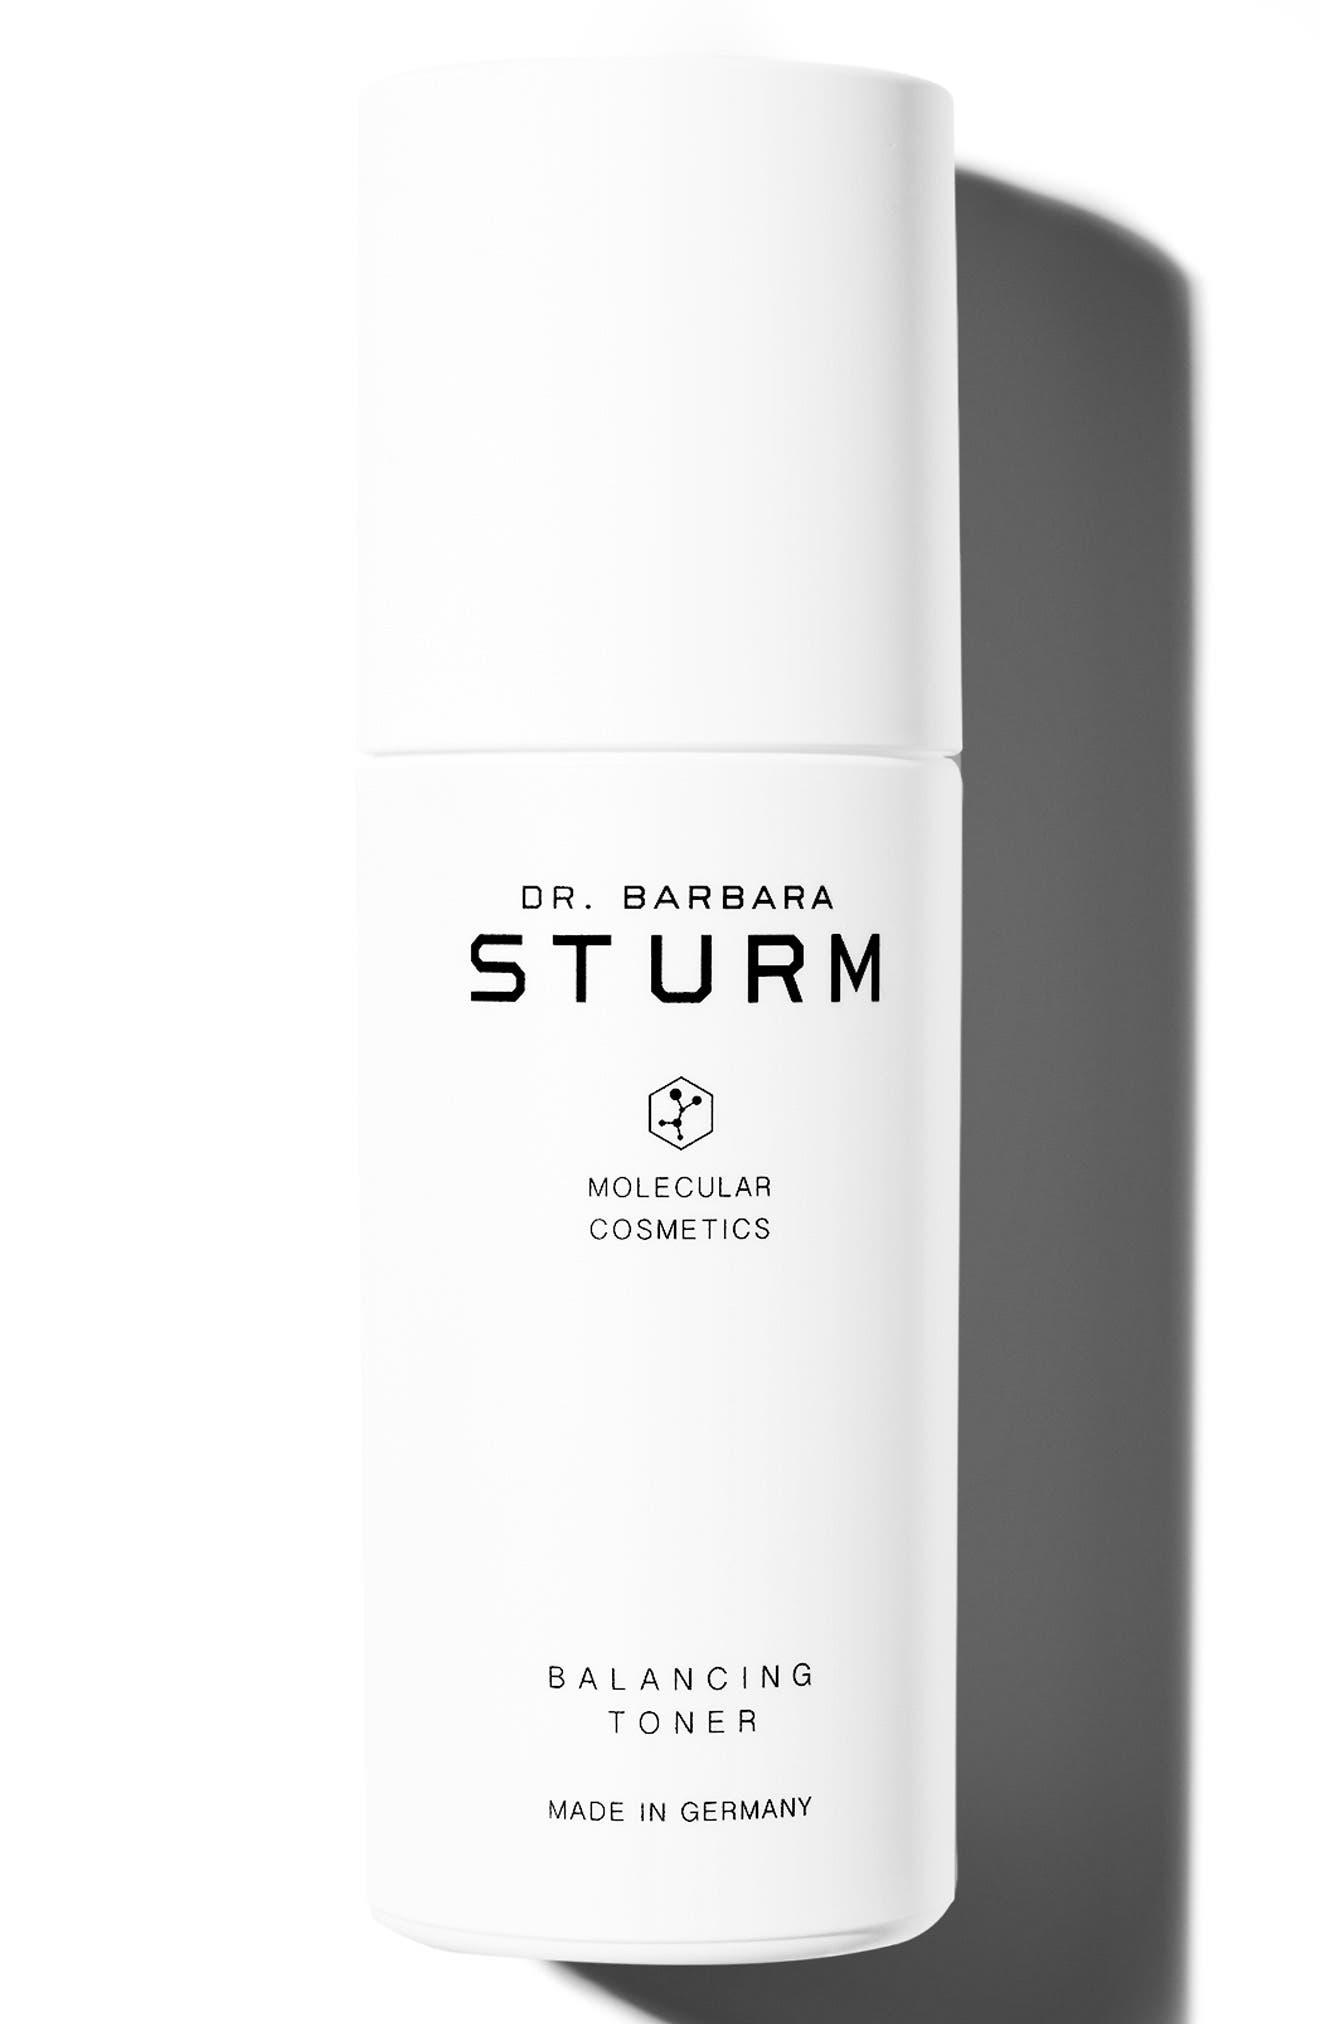 Dr. Barbara Sturm Balancing Toner